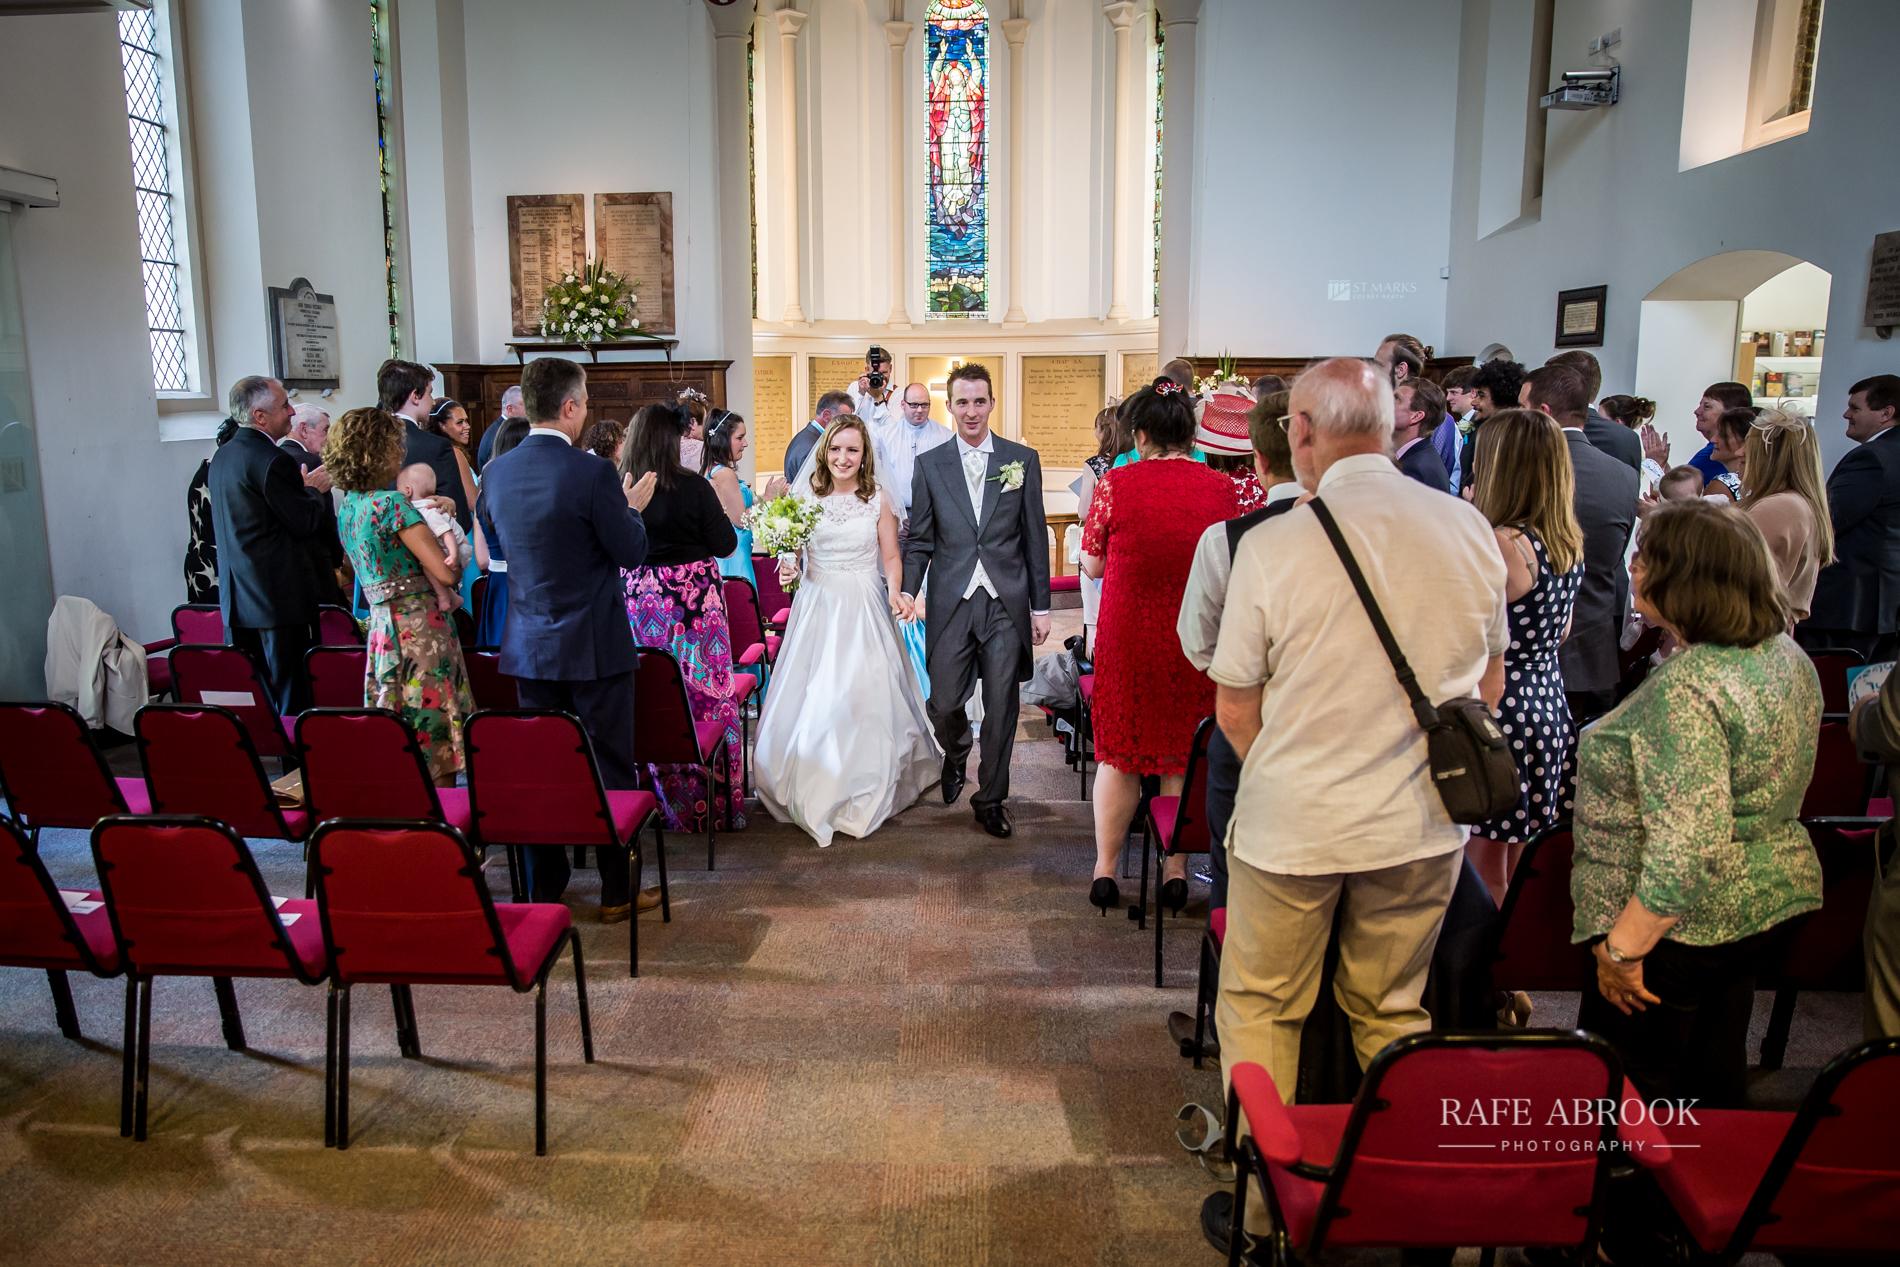 wedding photographer hertfordshire noke thistle hotel st albans -1231.jpg